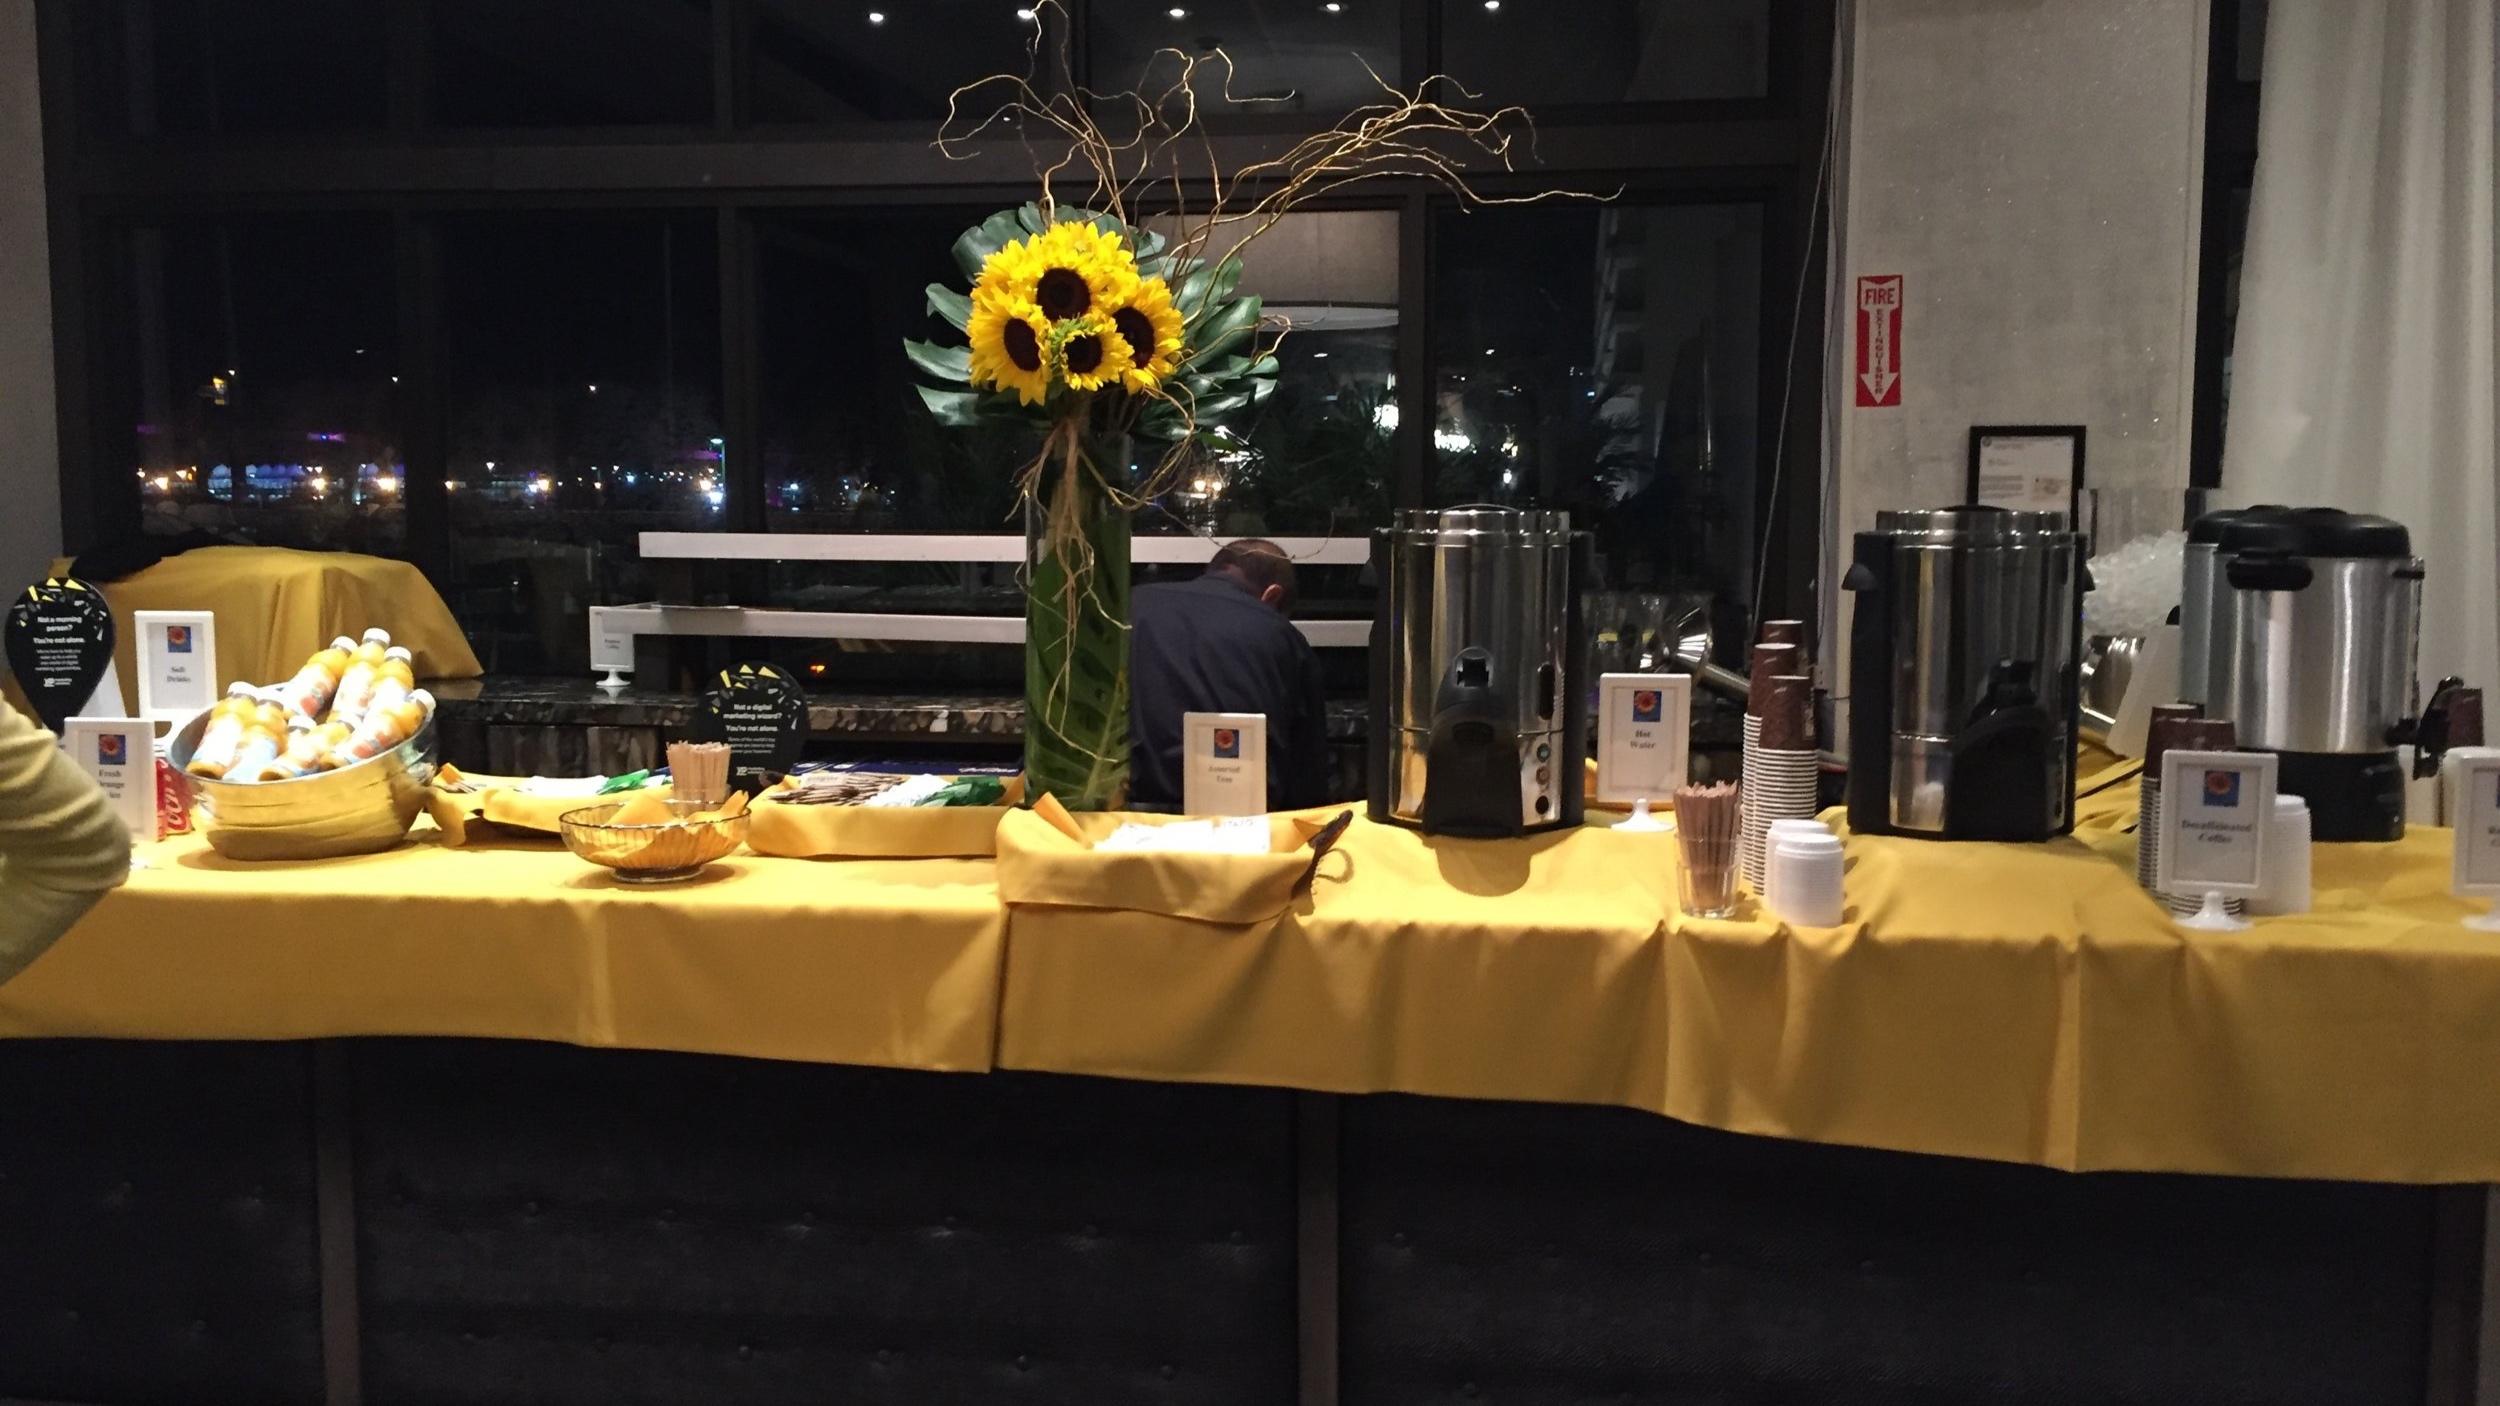 Food & beverage set up, Atlanta, GA